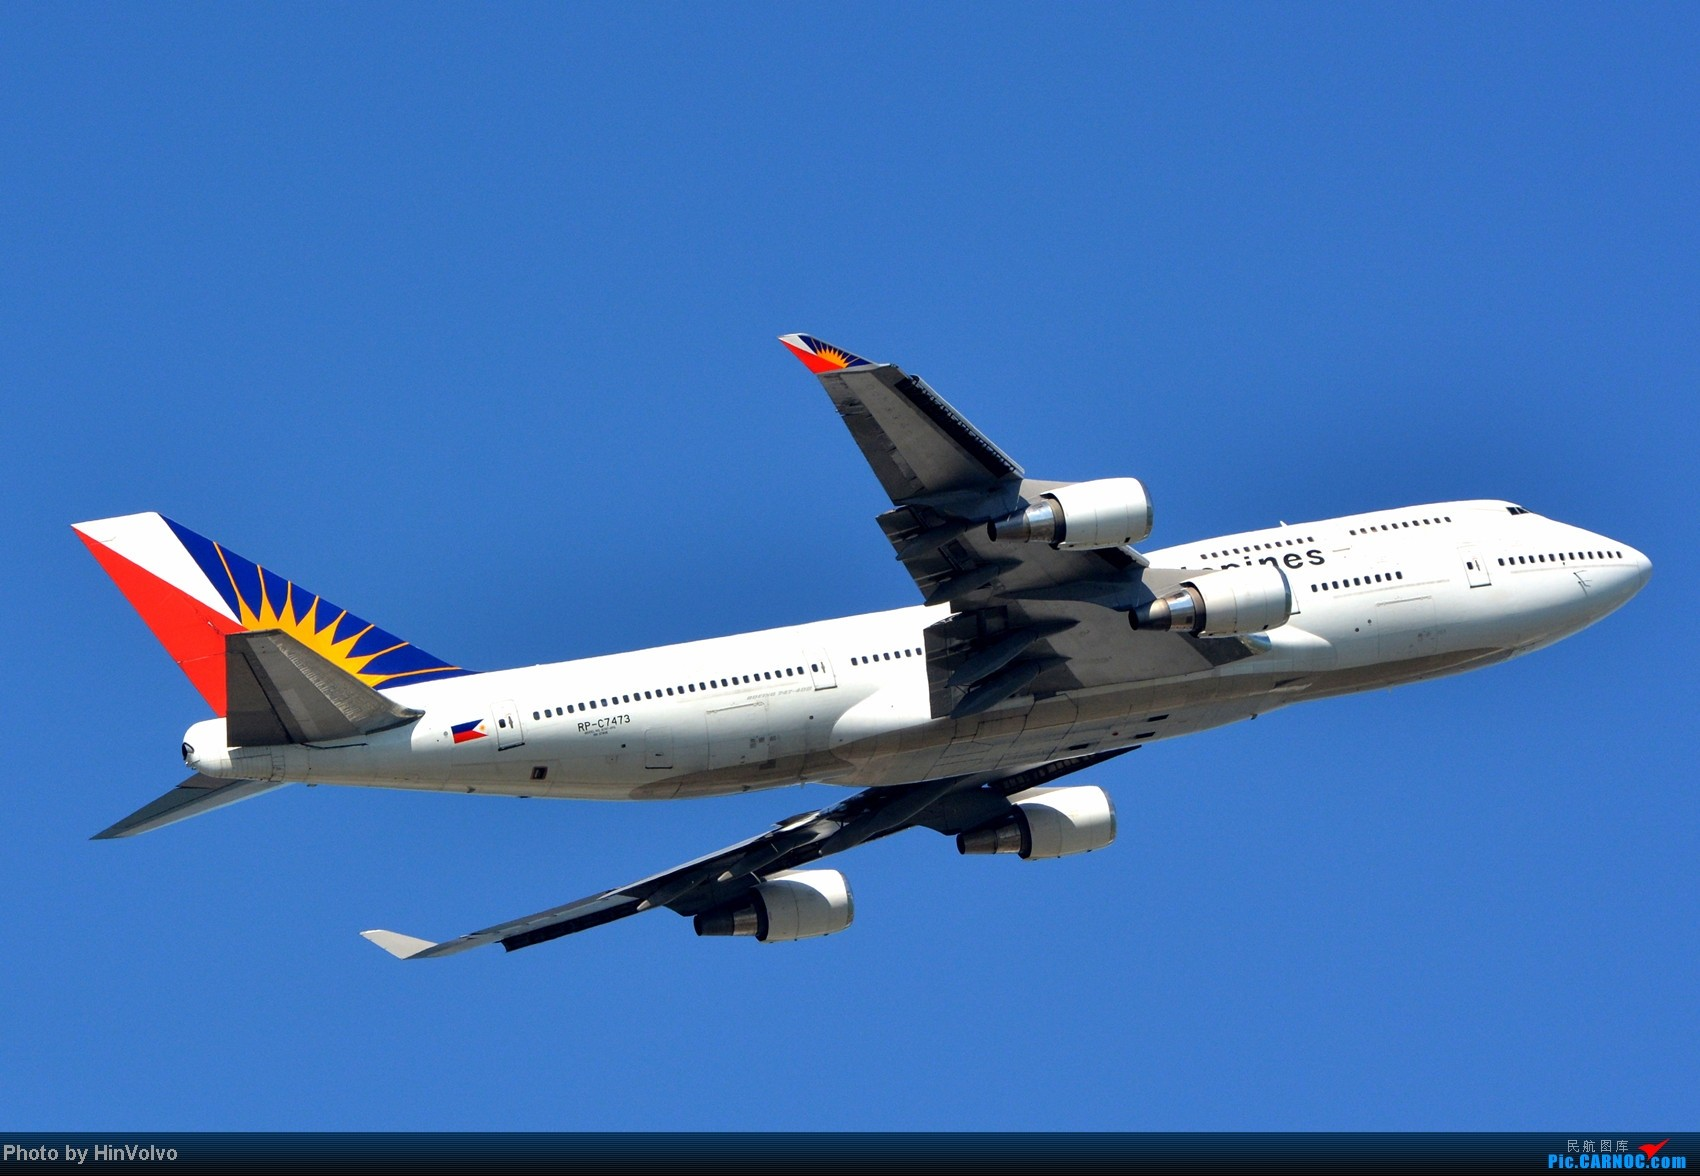 Re:[原创]~~~~多圖系列~~~HKG,早上好!寒冷的天氣出發前往機場拍到中午。 BOEING 747-400 RP-C7473 中国香港赤鱲角机场